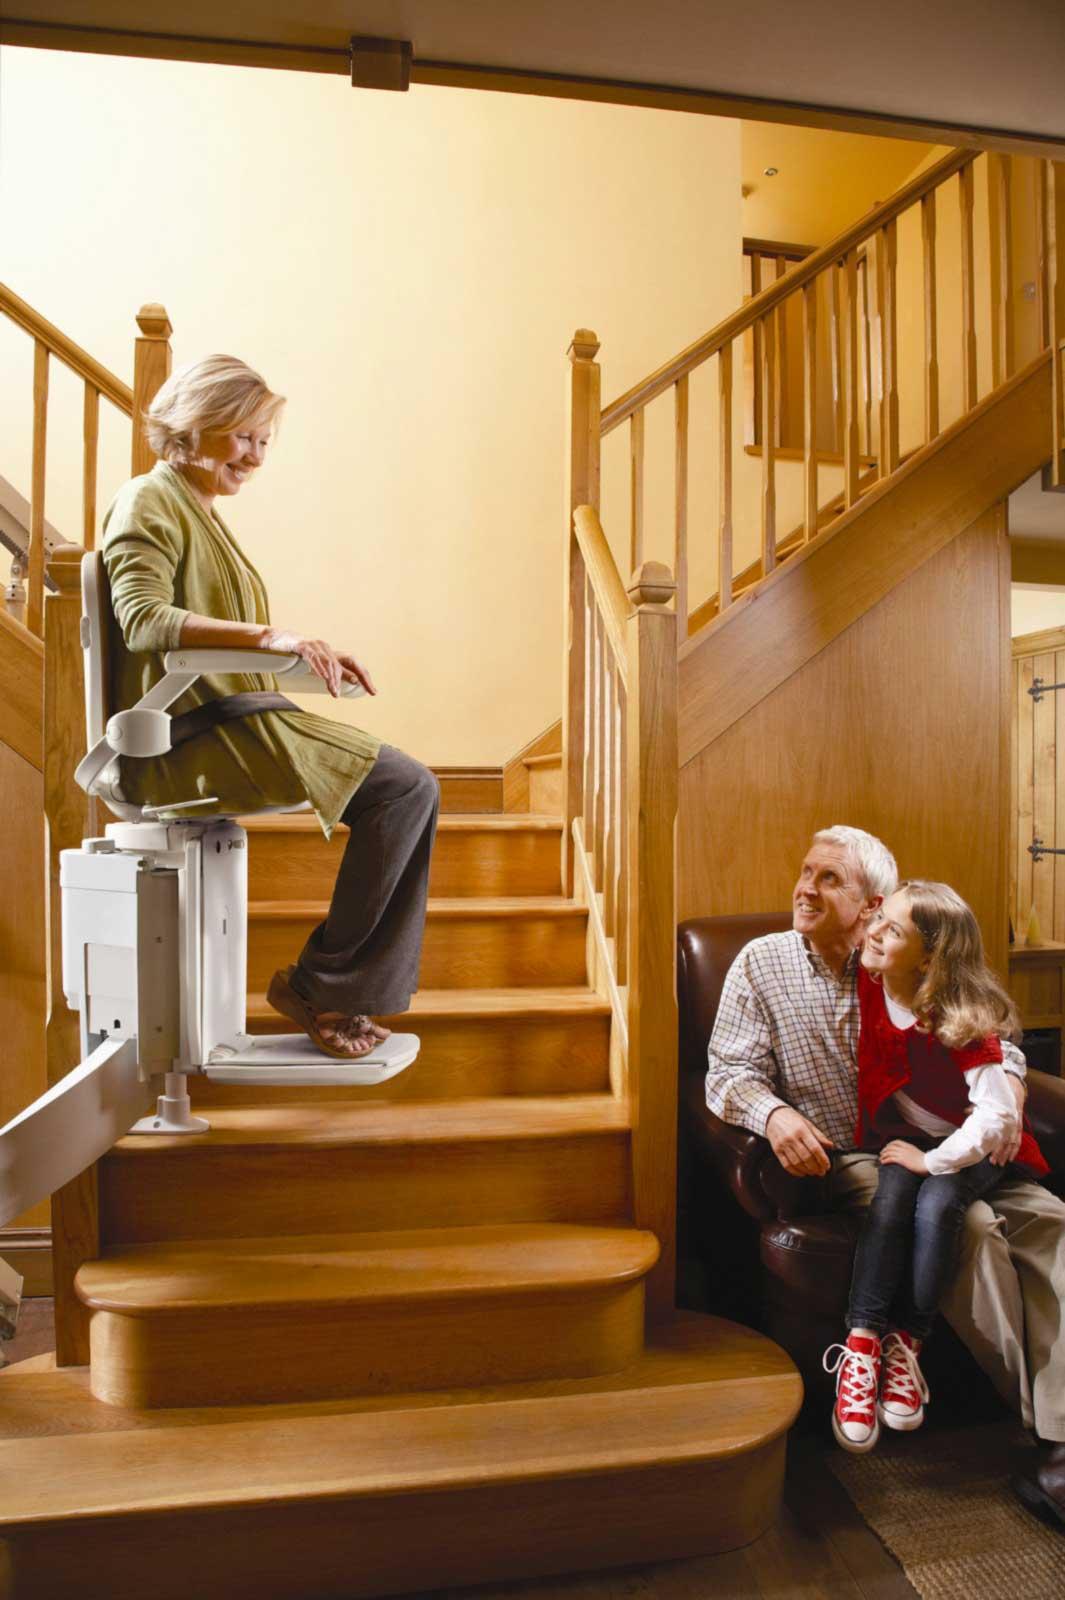 escalier escamotable electrique pas cher. Black Bedroom Furniture Sets. Home Design Ideas